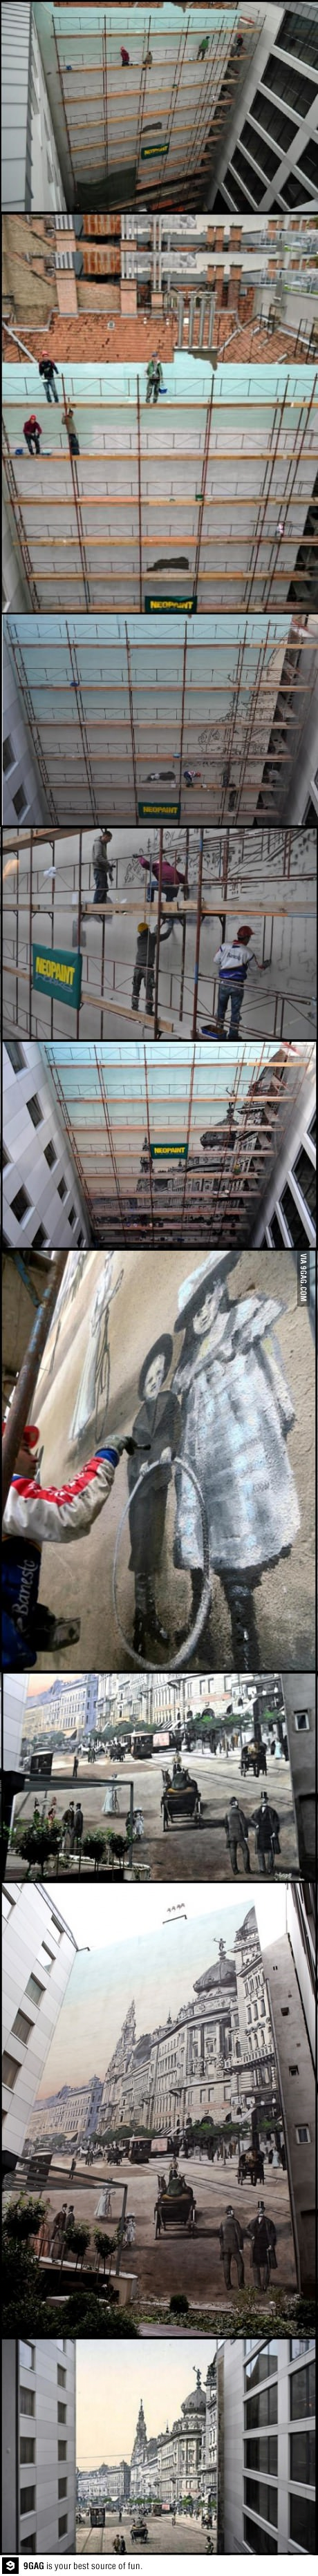 art, street, wall, city scape, wow